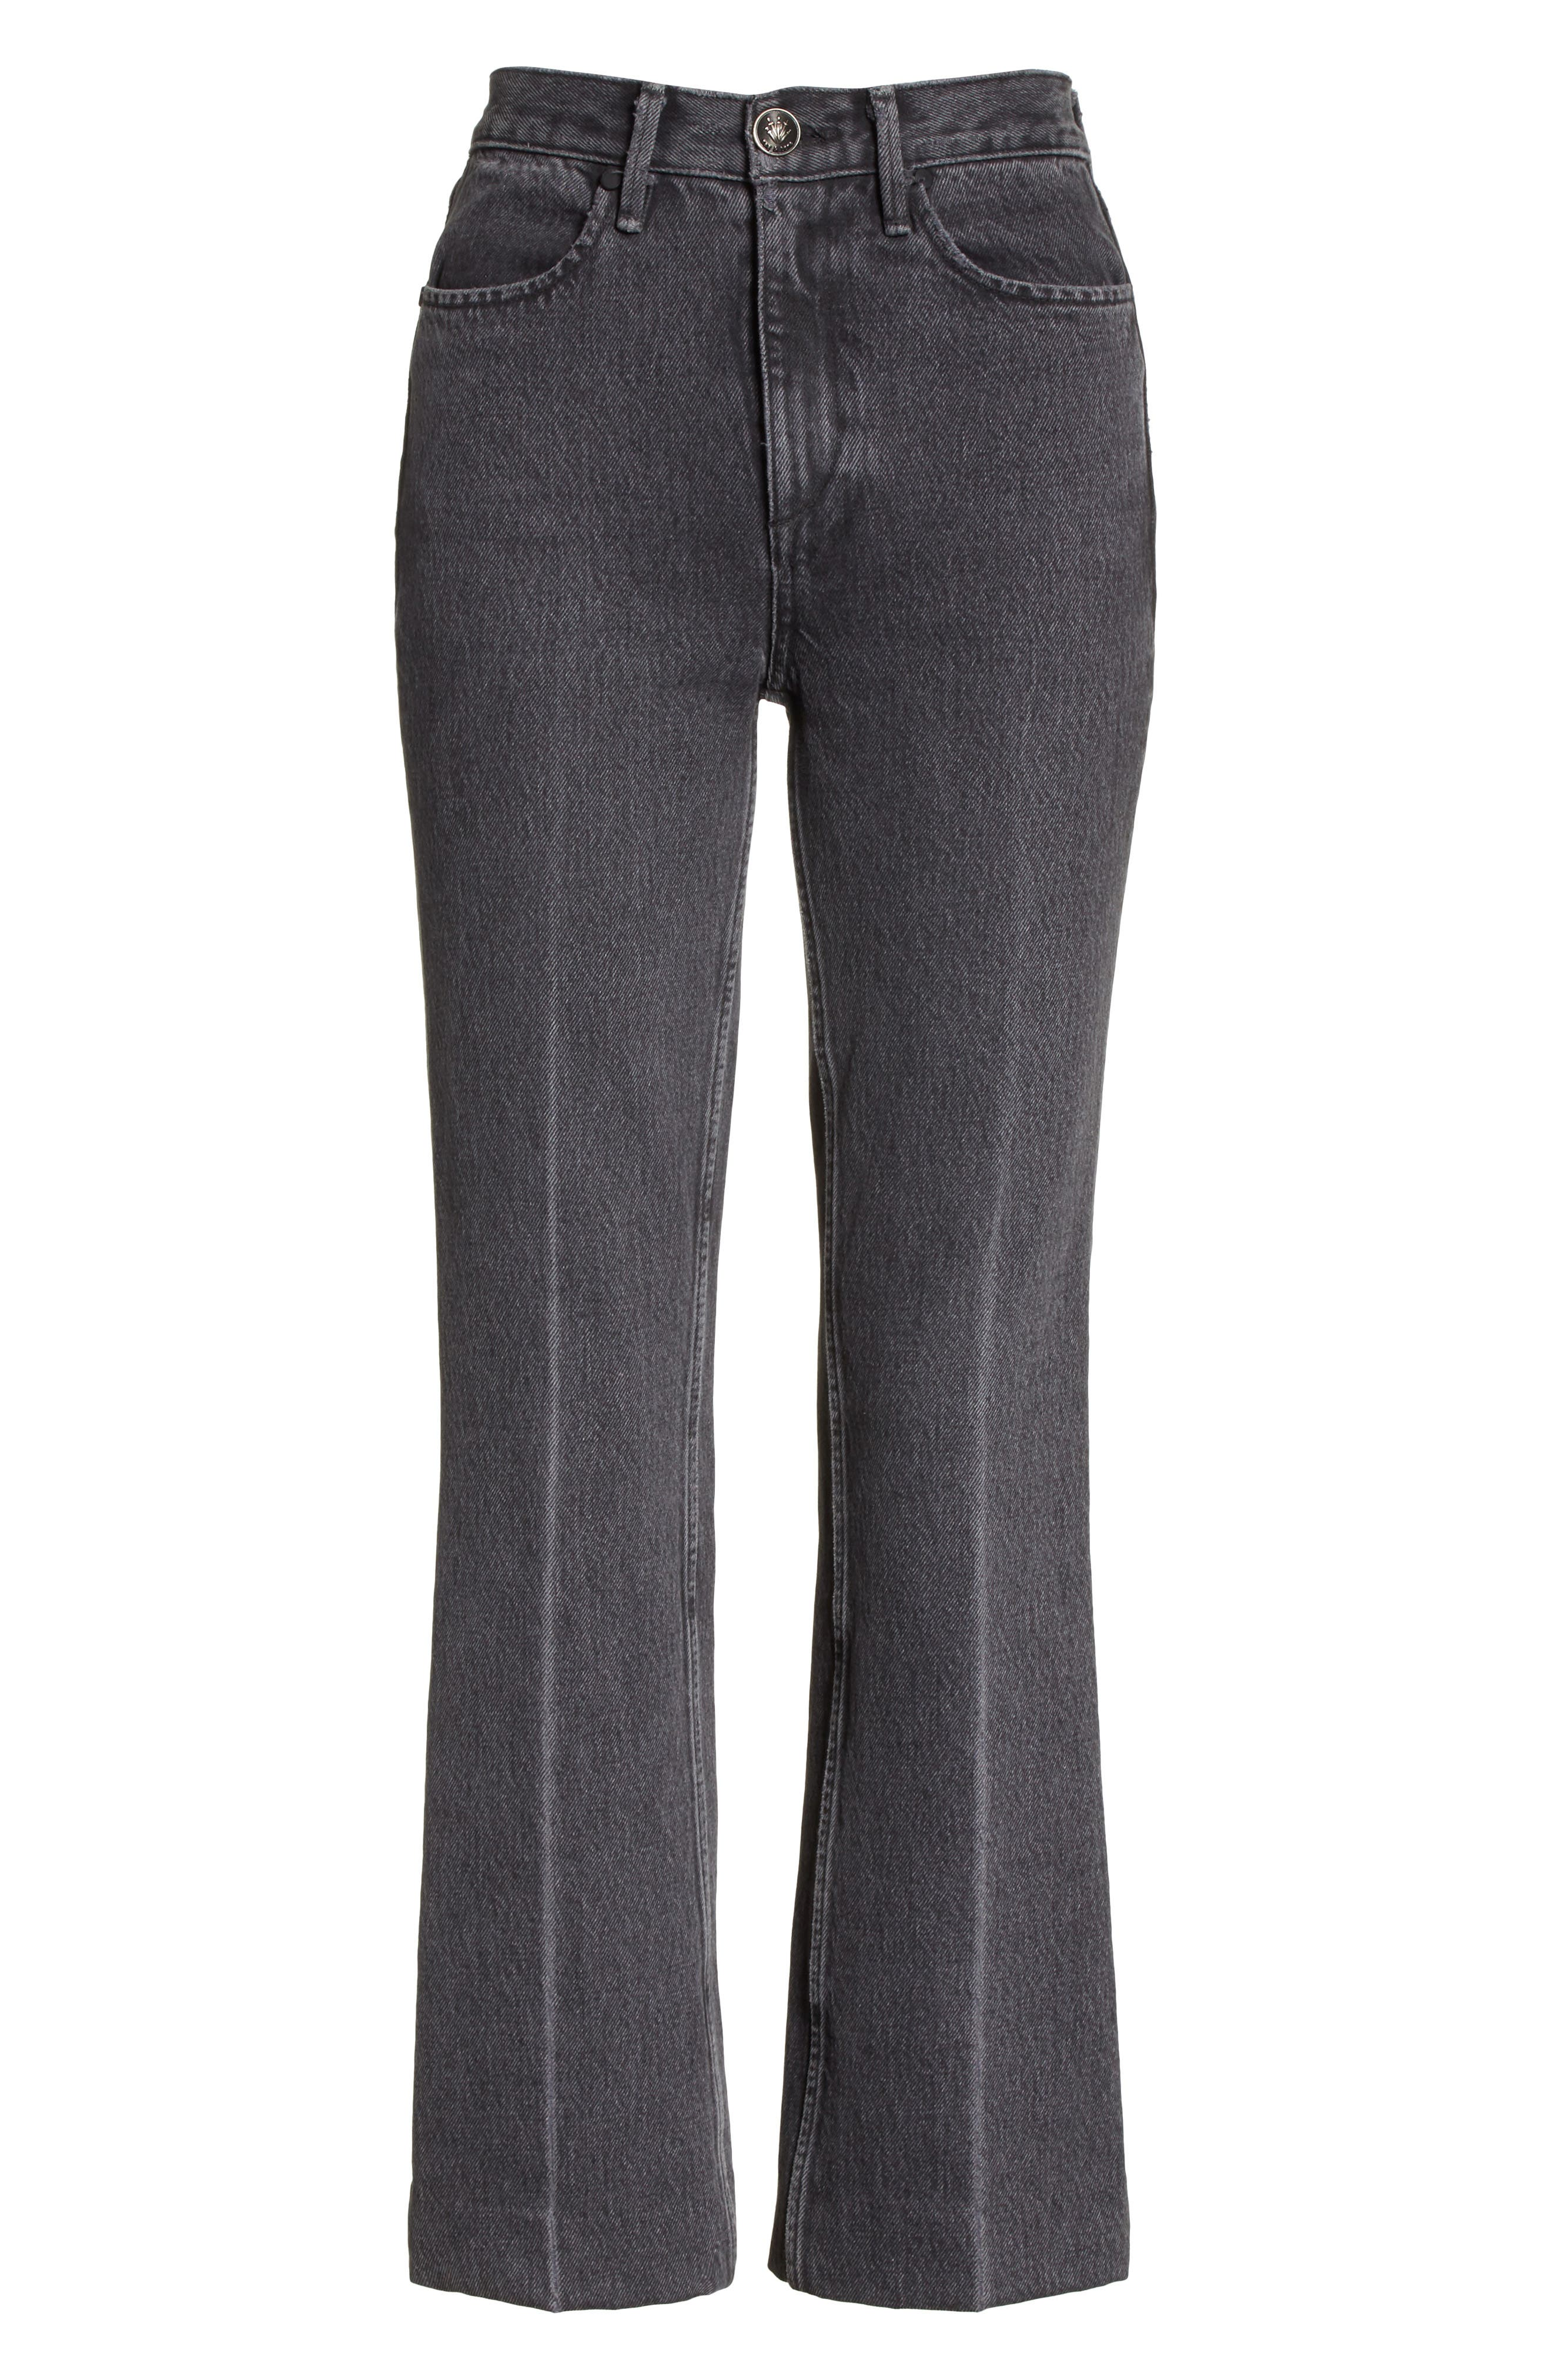 Dylan High Waist Crop Kick Flare Jeans,                             Alternate thumbnail 6, color,                             Grey Kuro